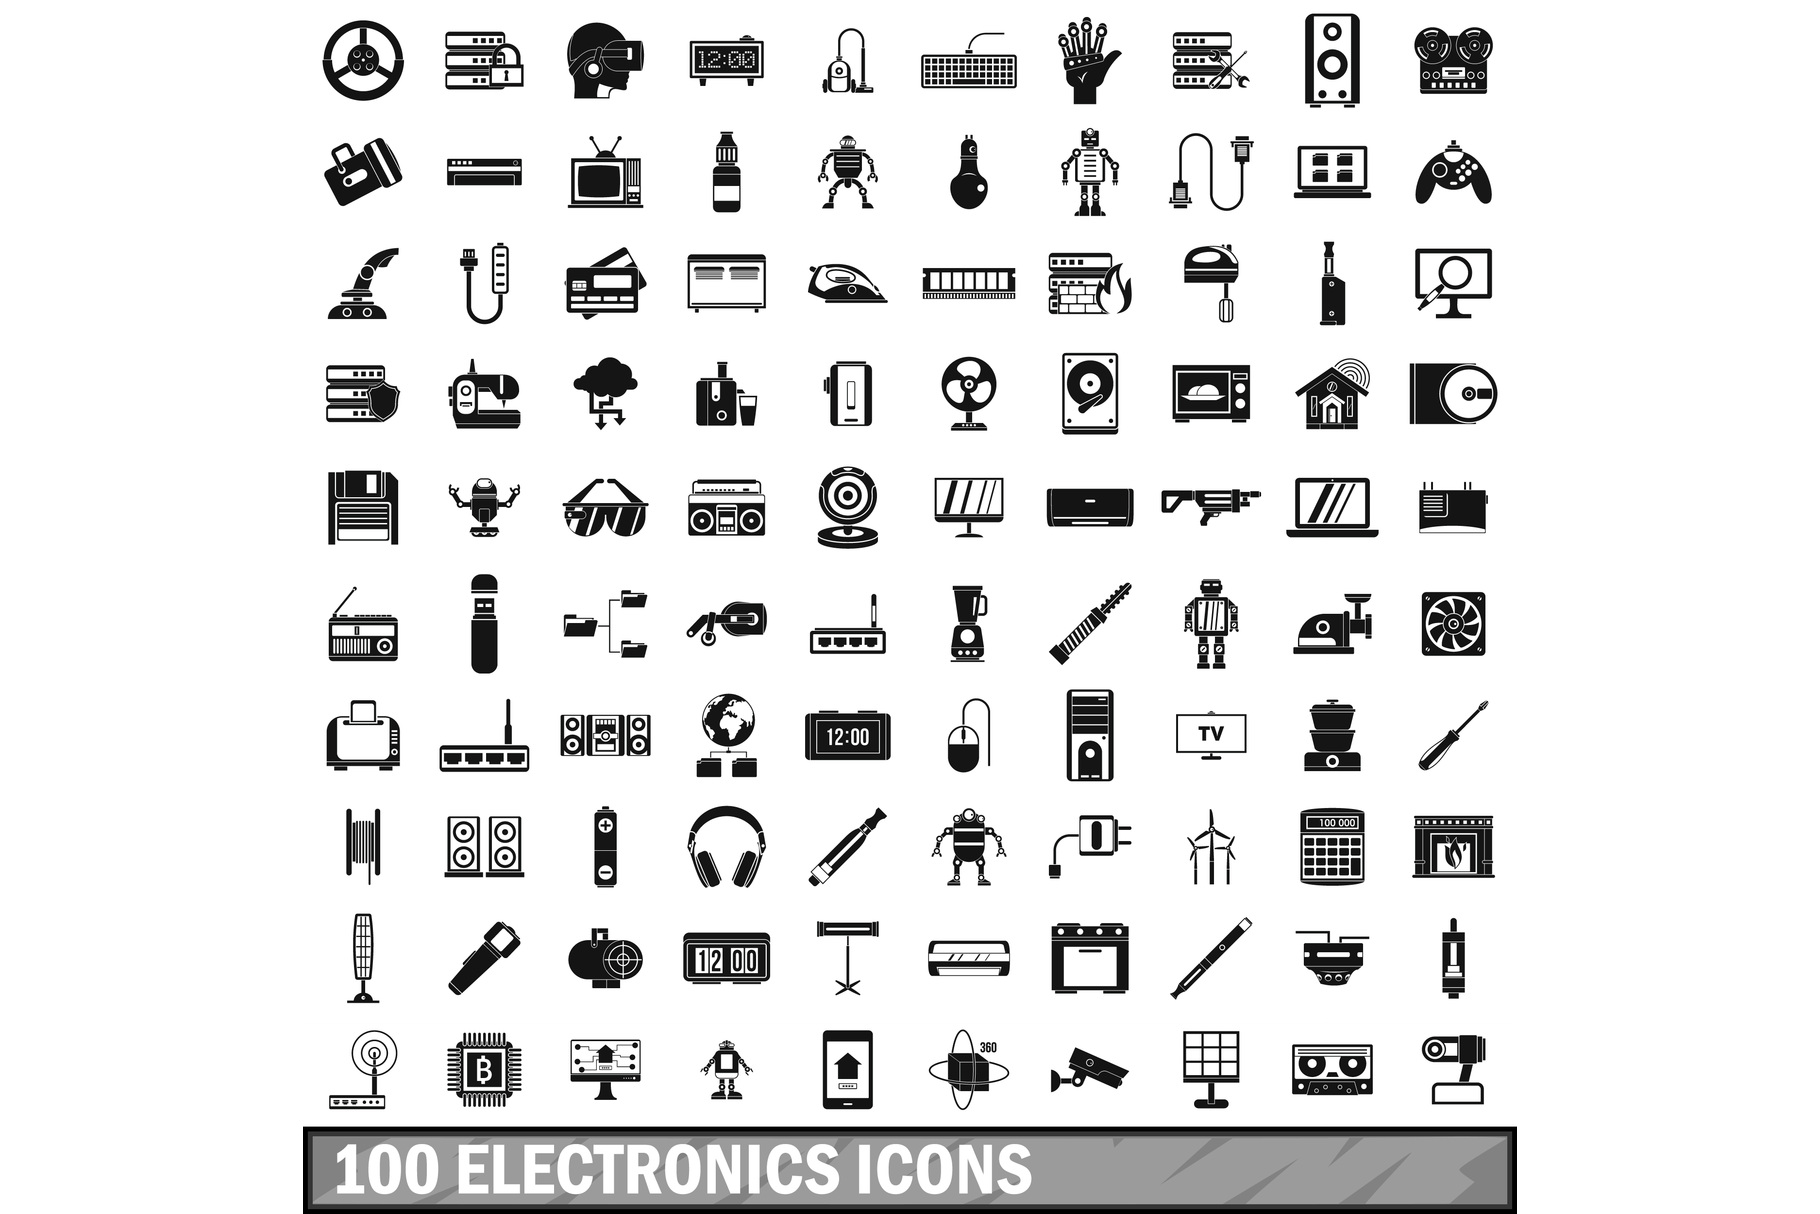 100 electronics icons set, simple style example image 1